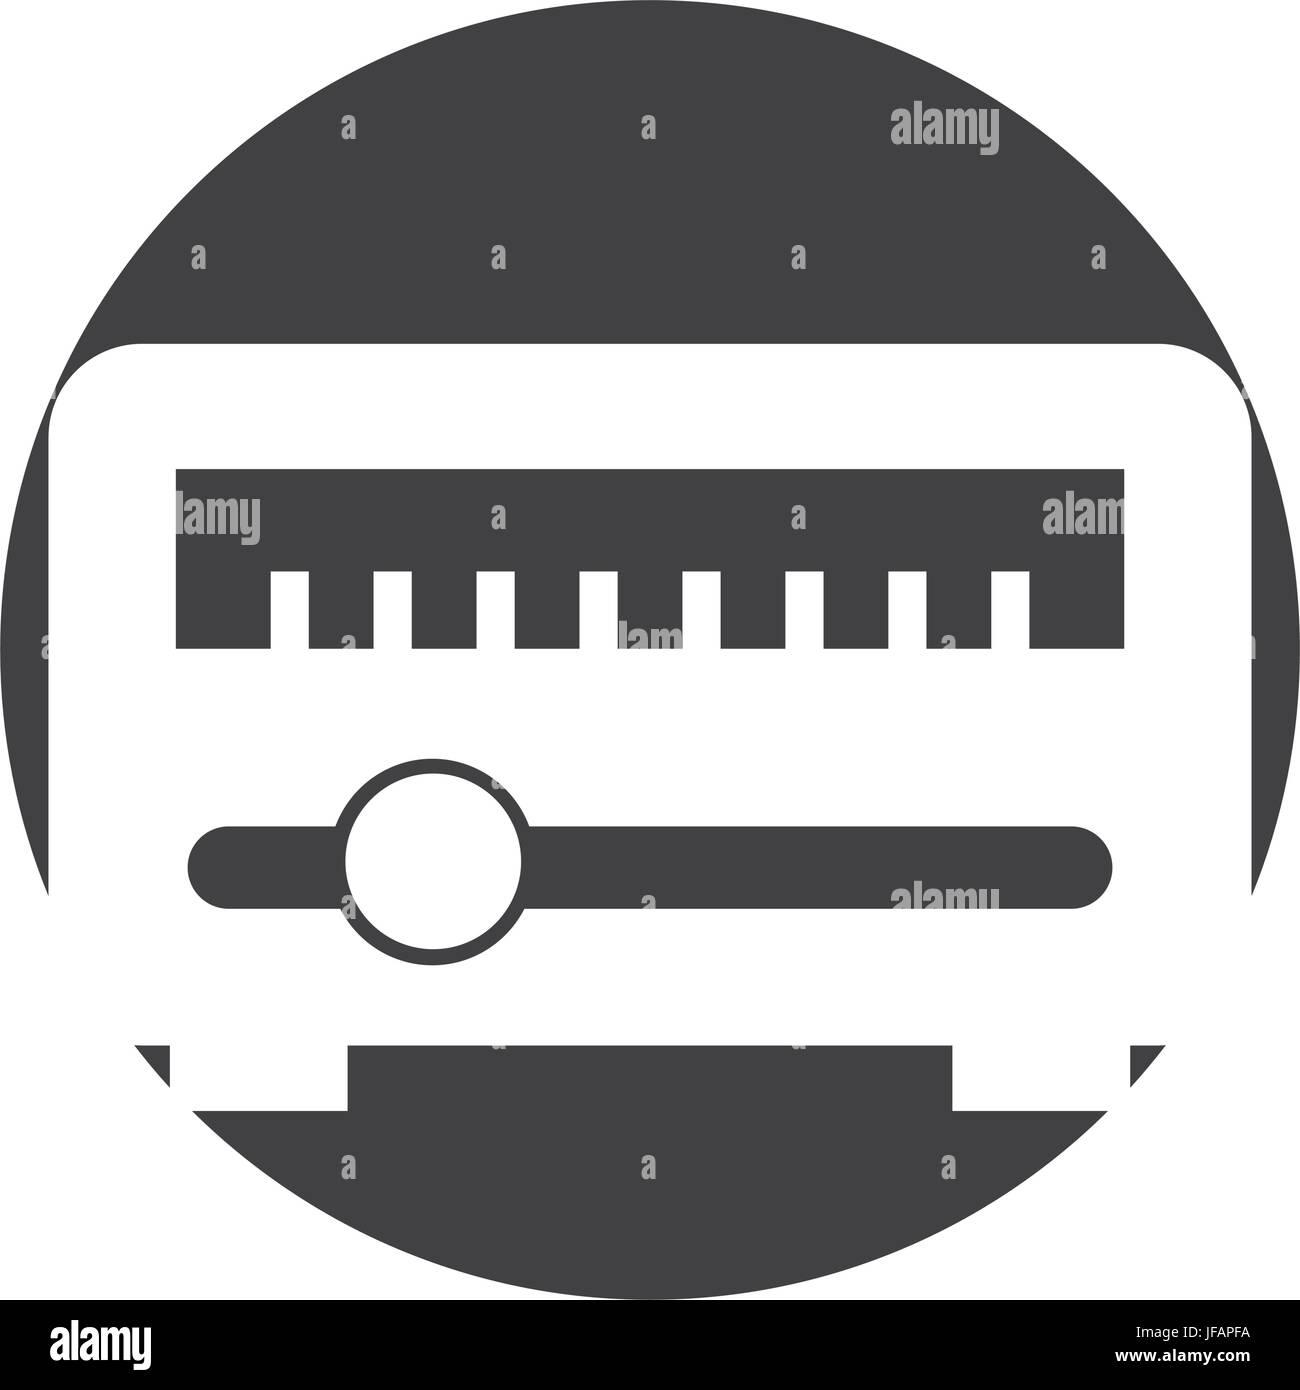 News satellite radio stock vector art illustration vector image news satellite radio biocorpaavc